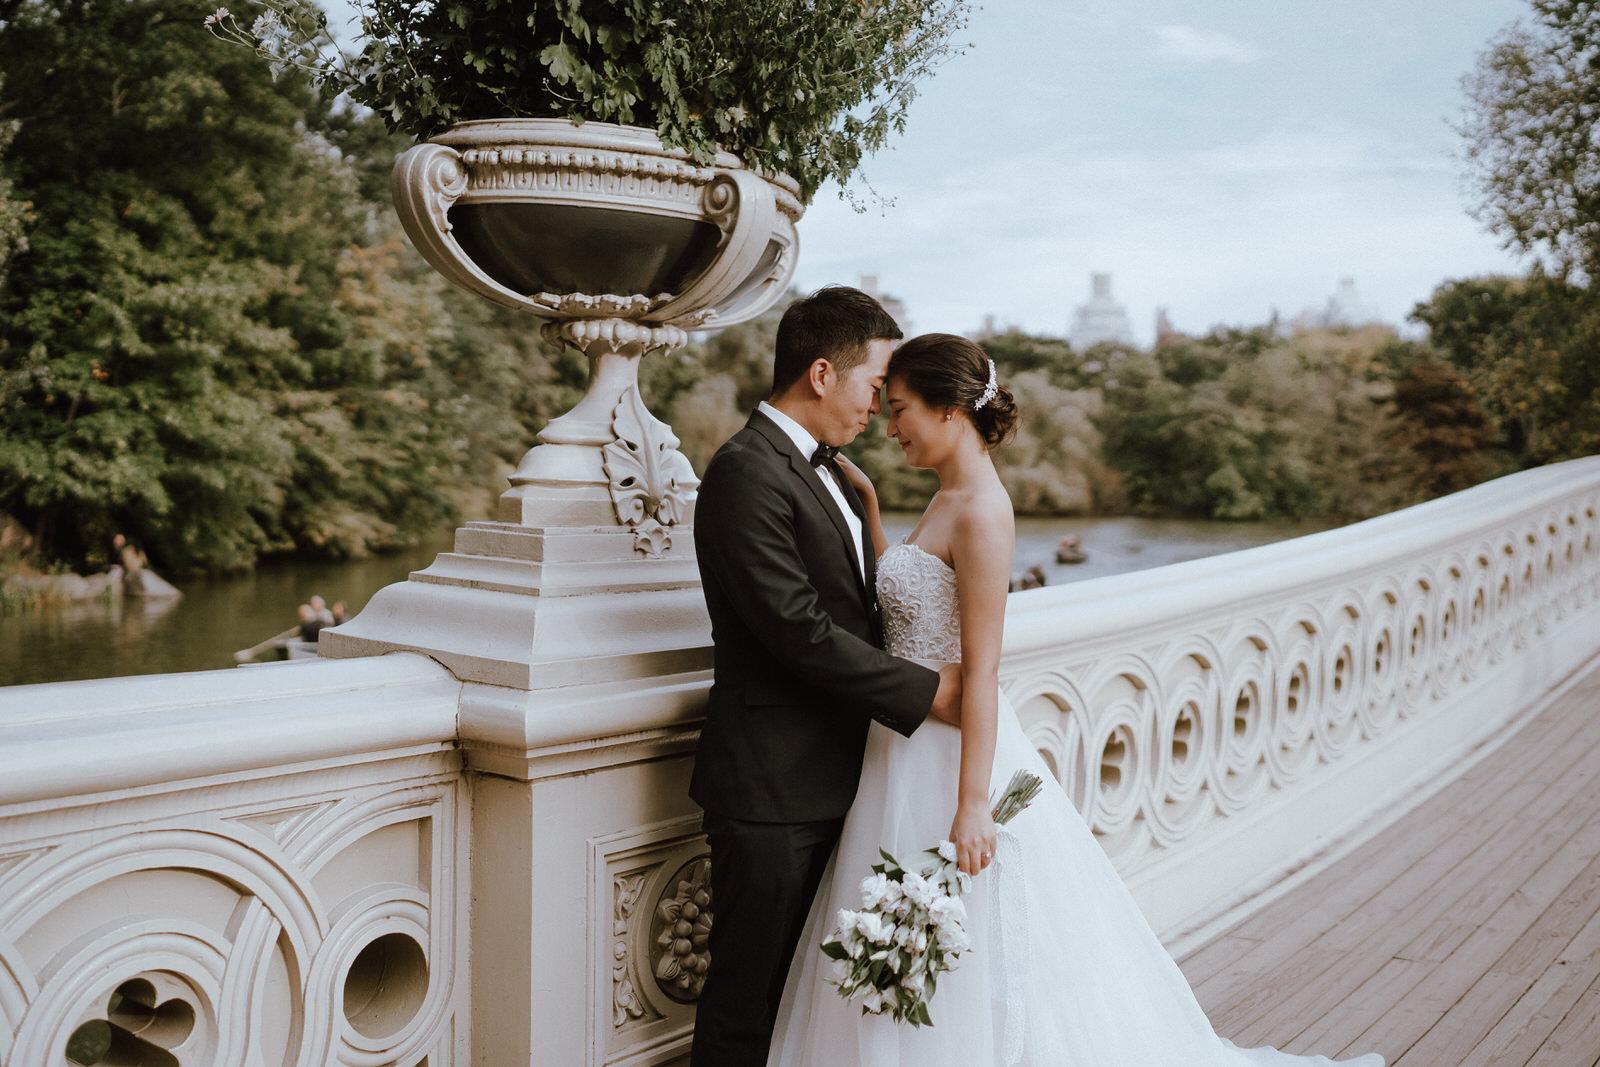 Central Park Elopement Photos-Bow Bridge-Michelle Gonzalez Photography- New York Wedding Photographer-4.jpg